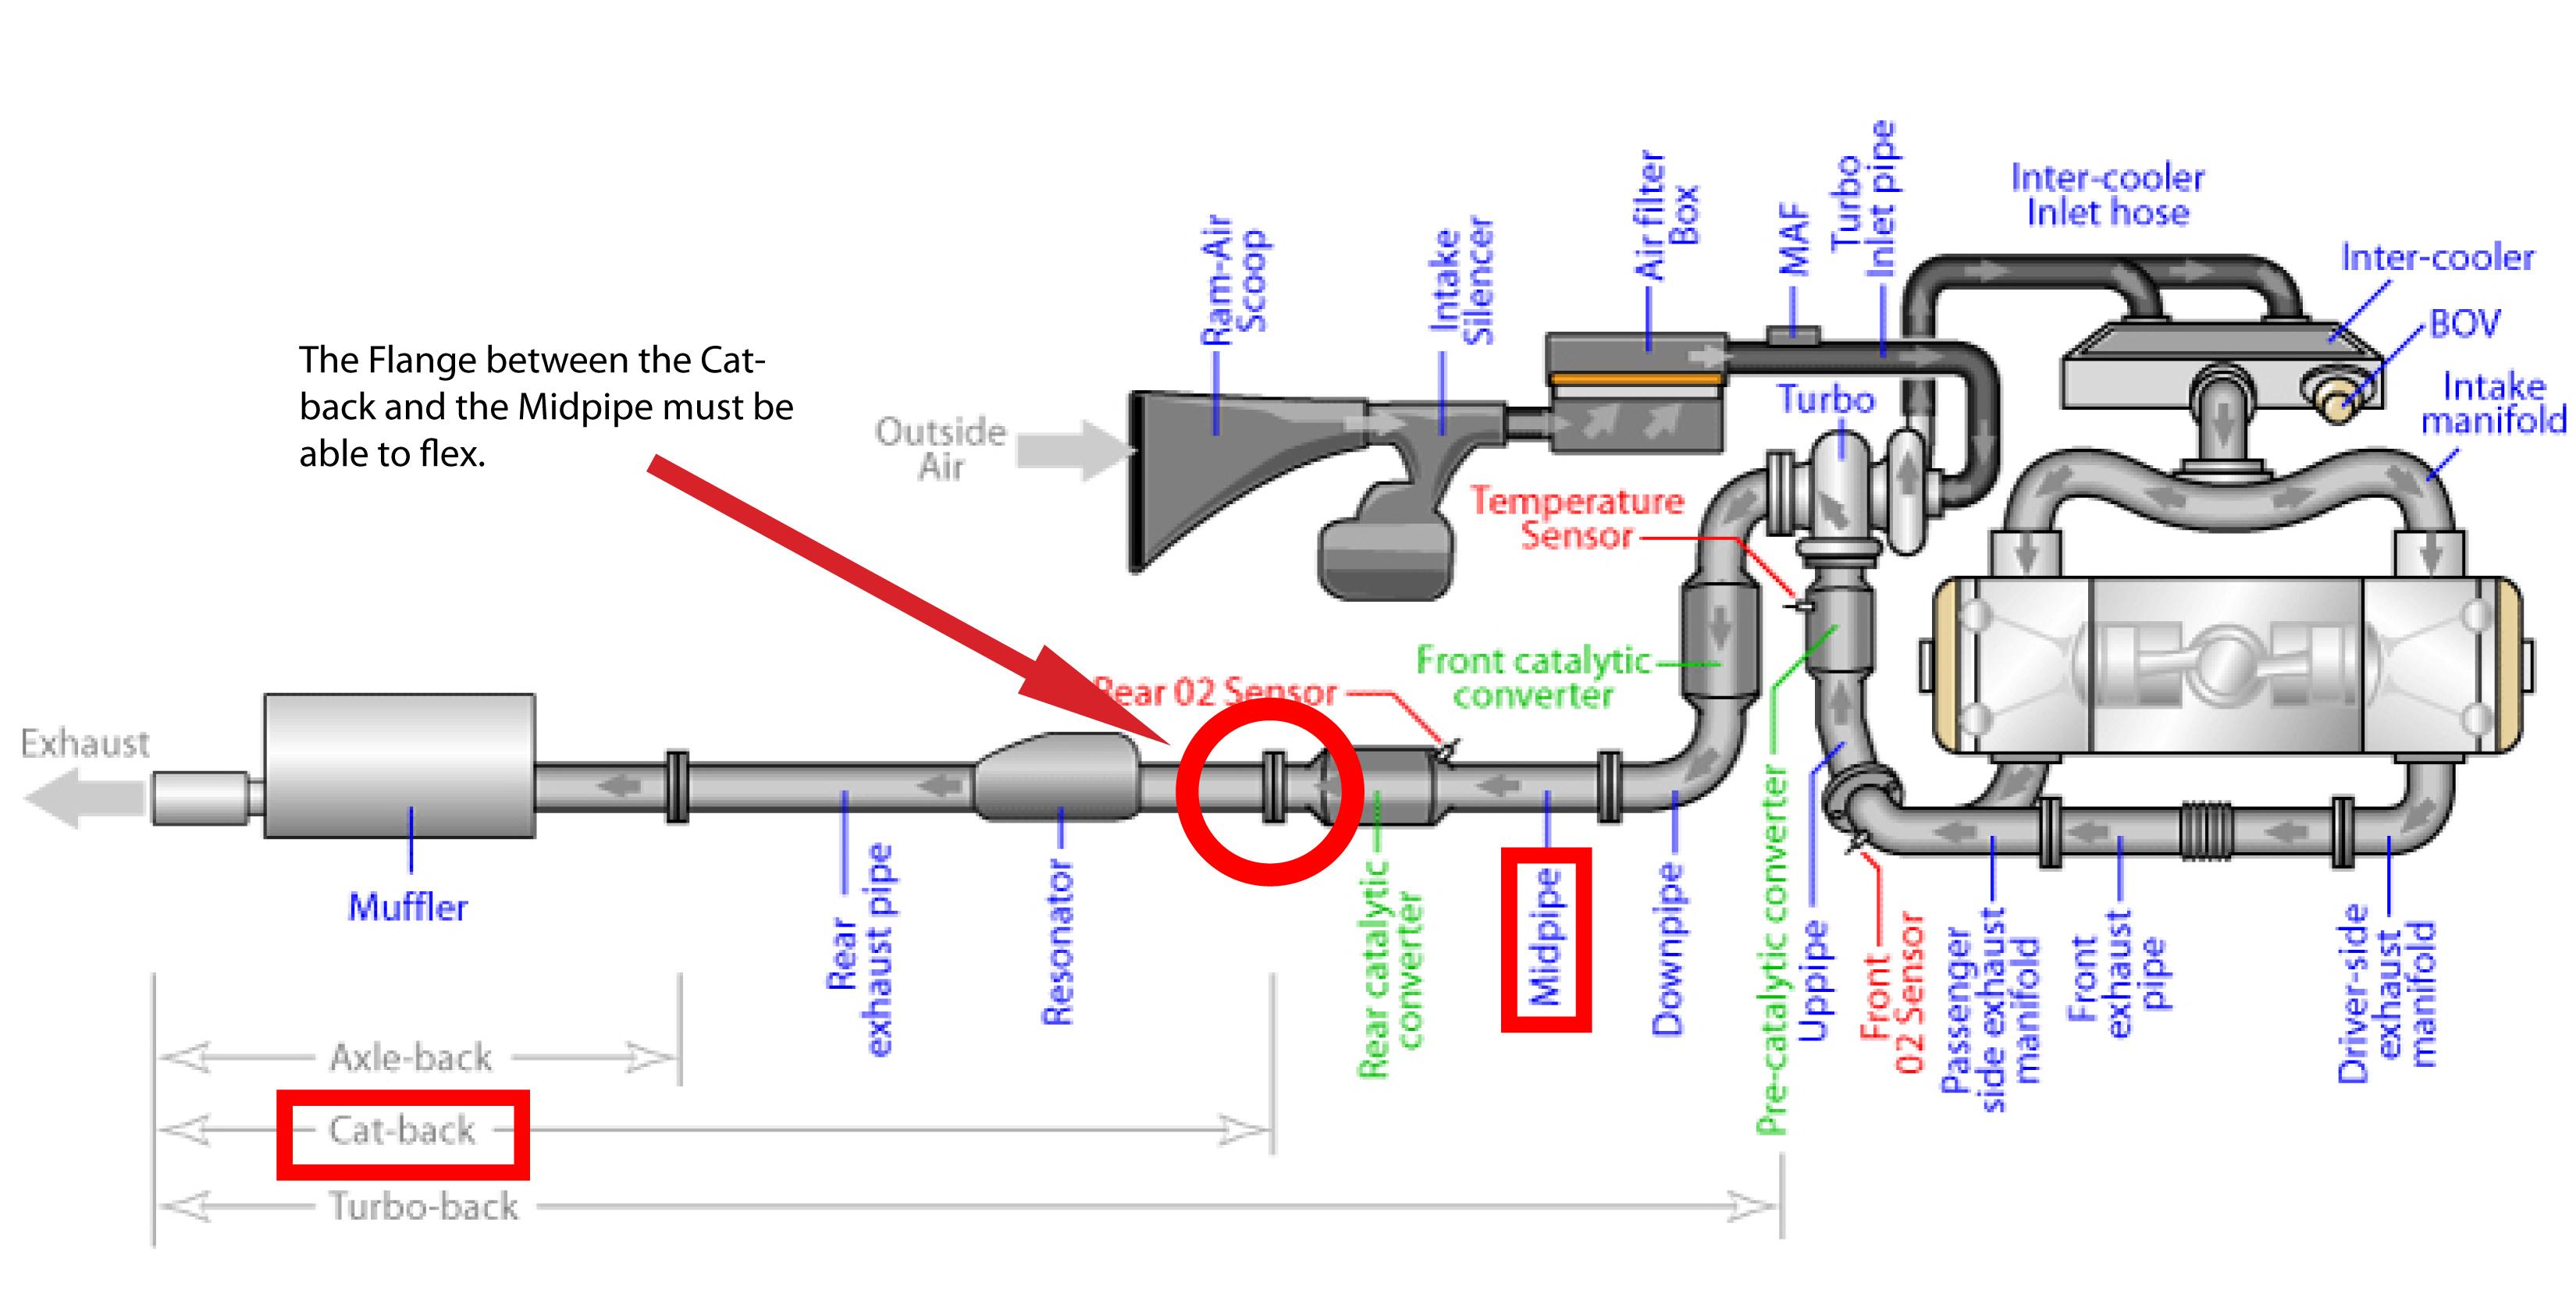 2000 Subaru Exhaust Diagram Electrical Wiring Diagrams Forester 1998 Auto U2022